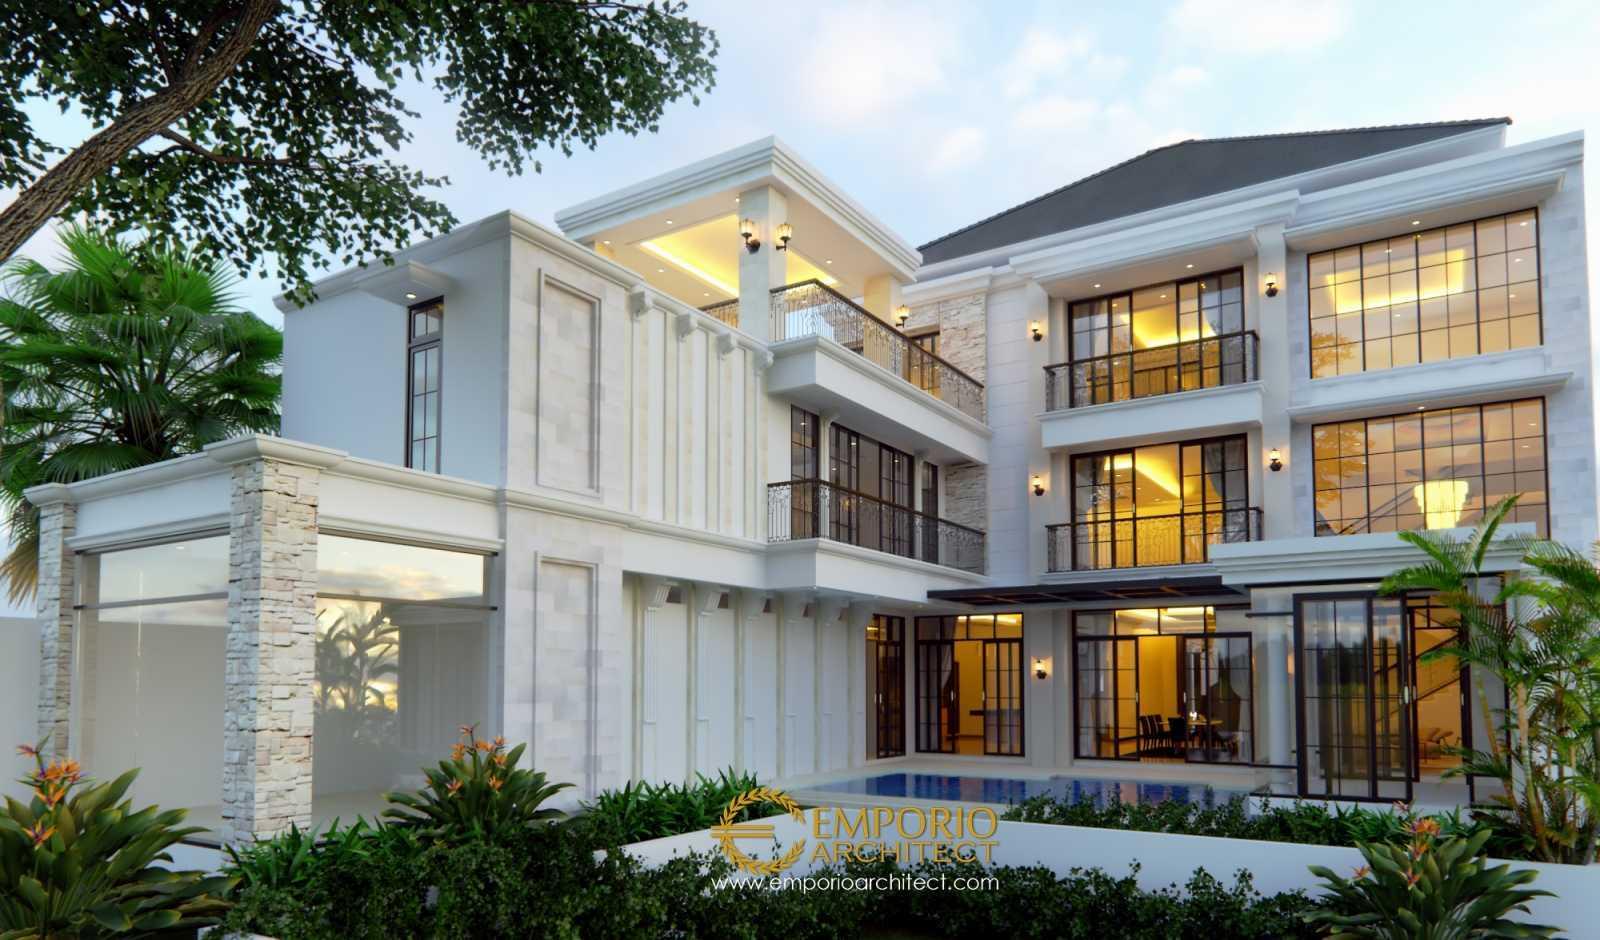 Photo emporio-architect-jasa-arsitek-jakarta-desain-rumah ...